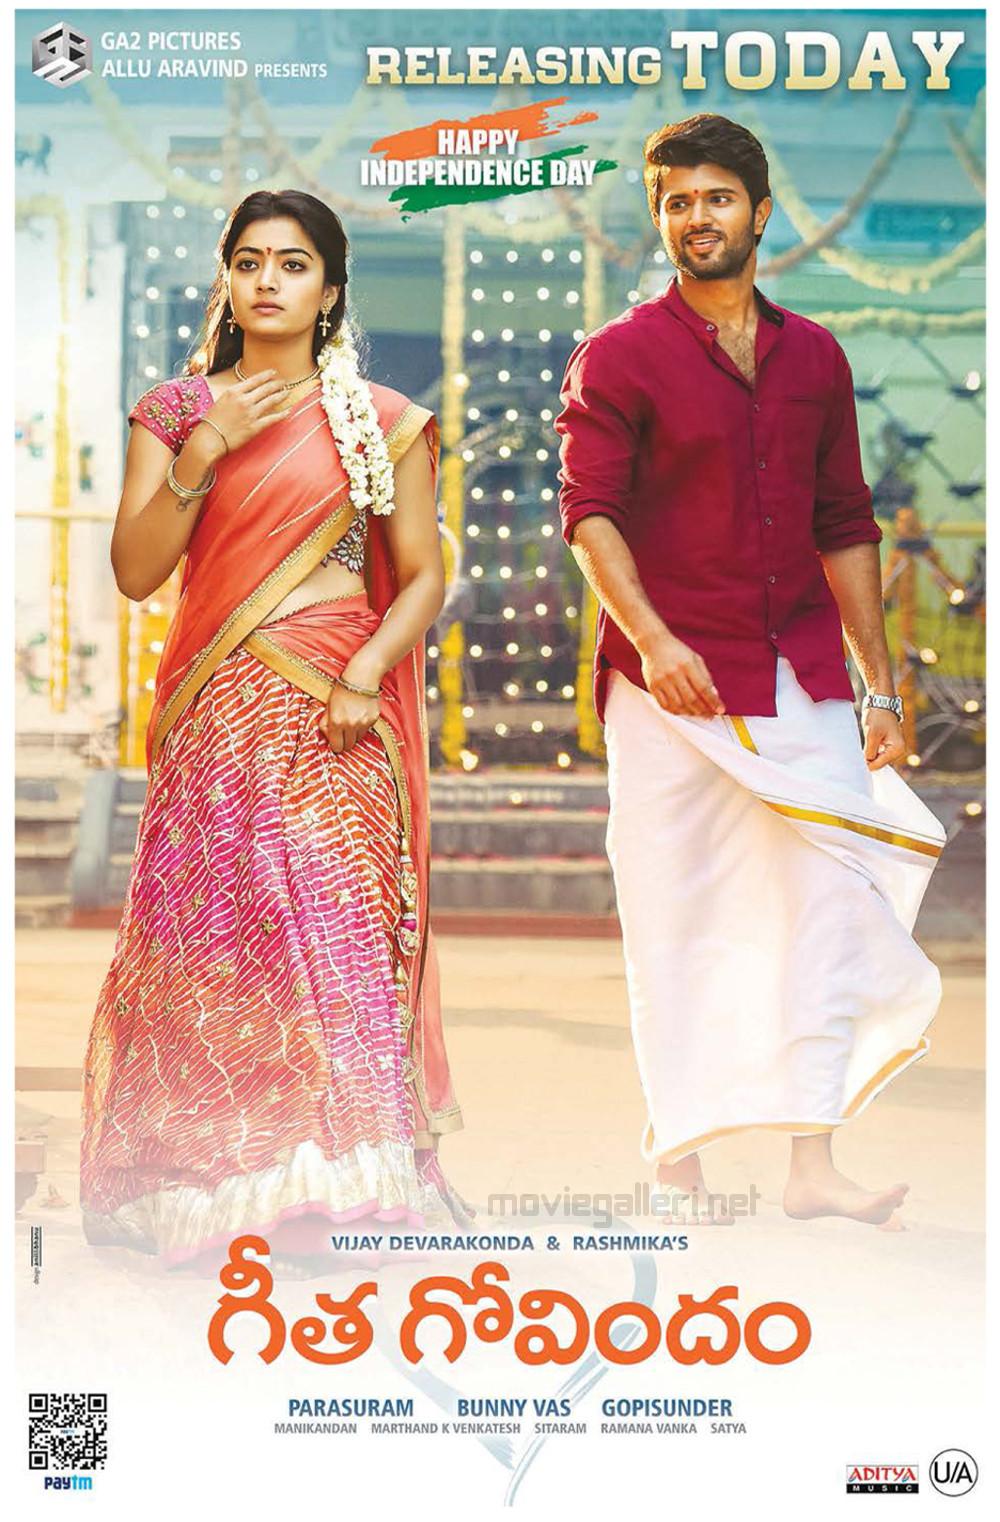 Rashmika Vijay Devarakonda Geetha Govindam Movie Release Today Posters